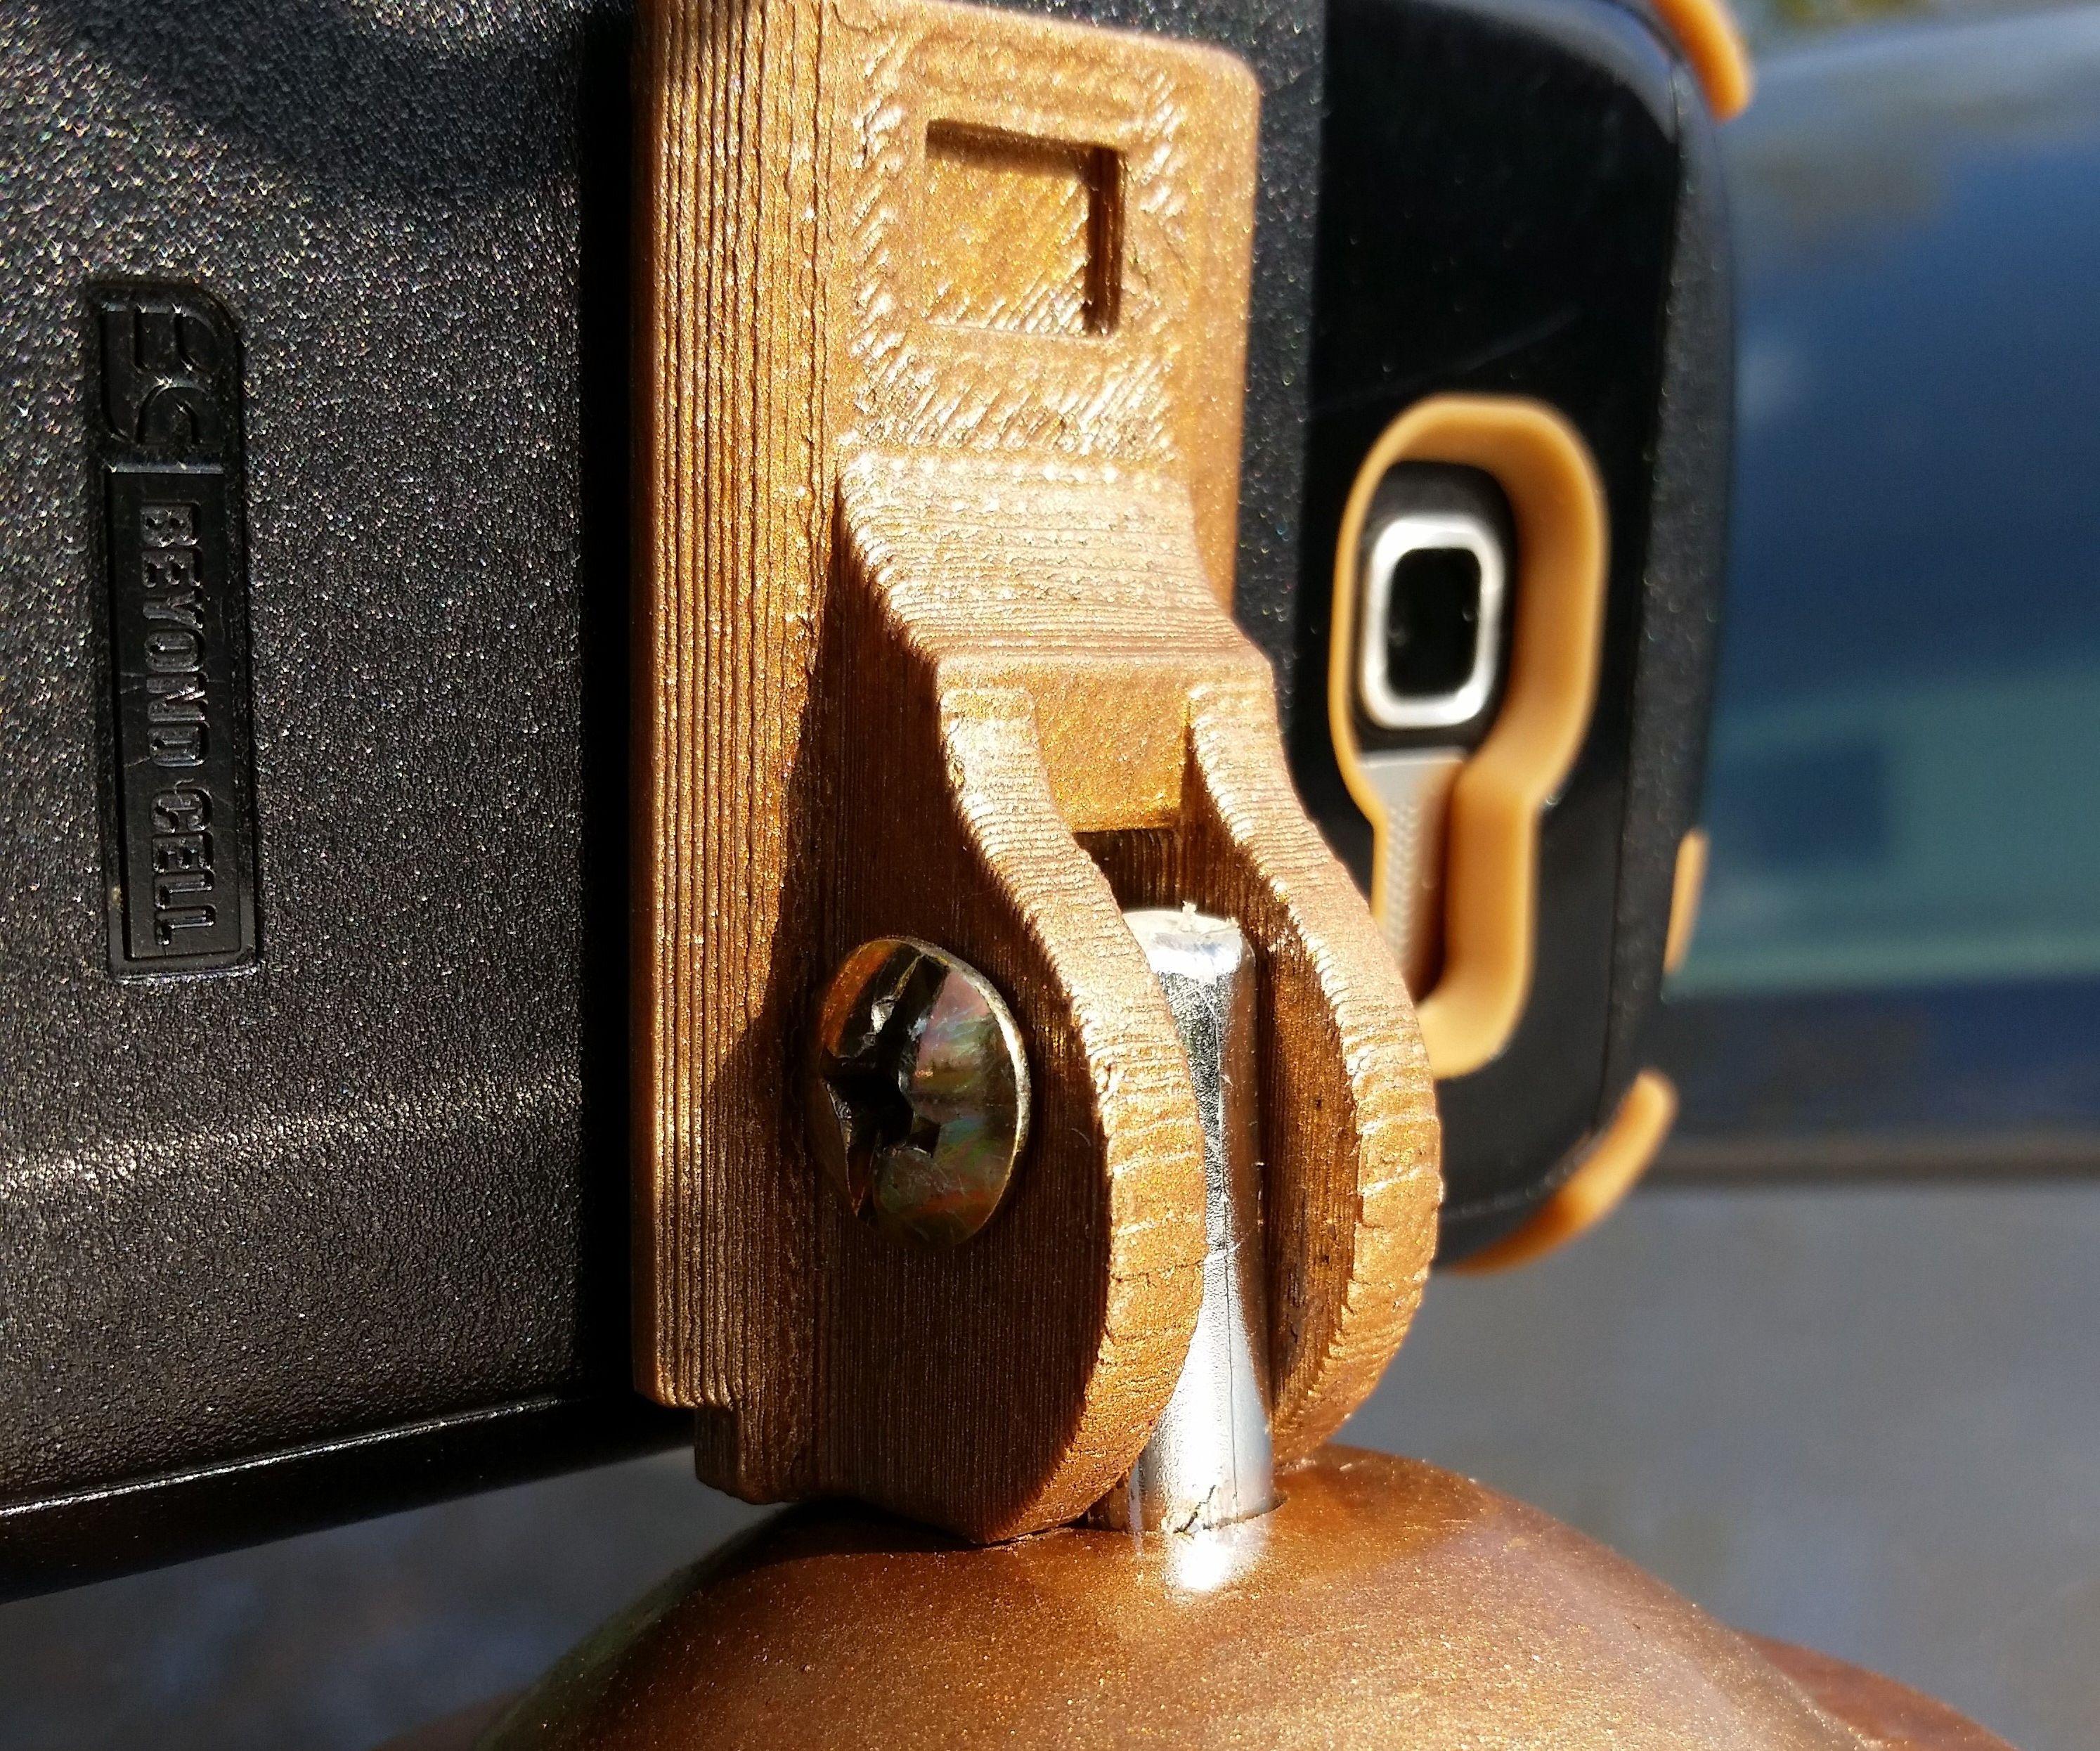 DIY Dash Camera for under $20